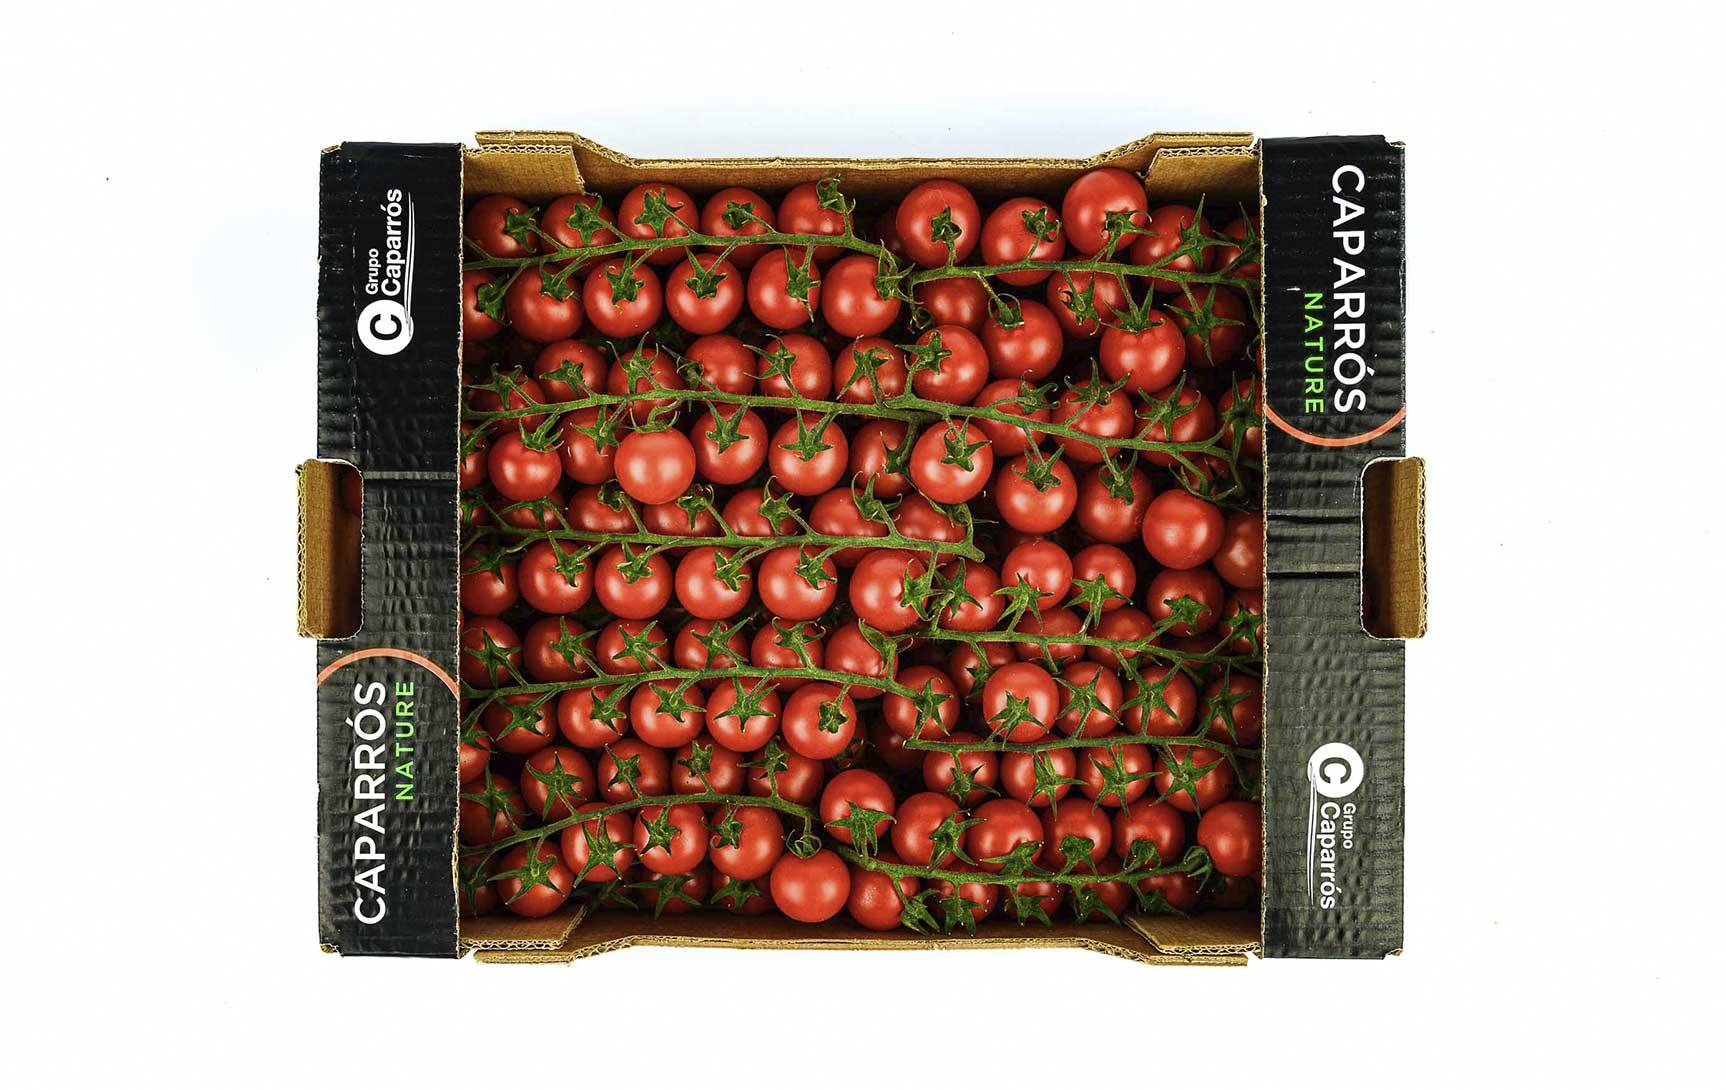 Tomate Cherry rama - Caparrós